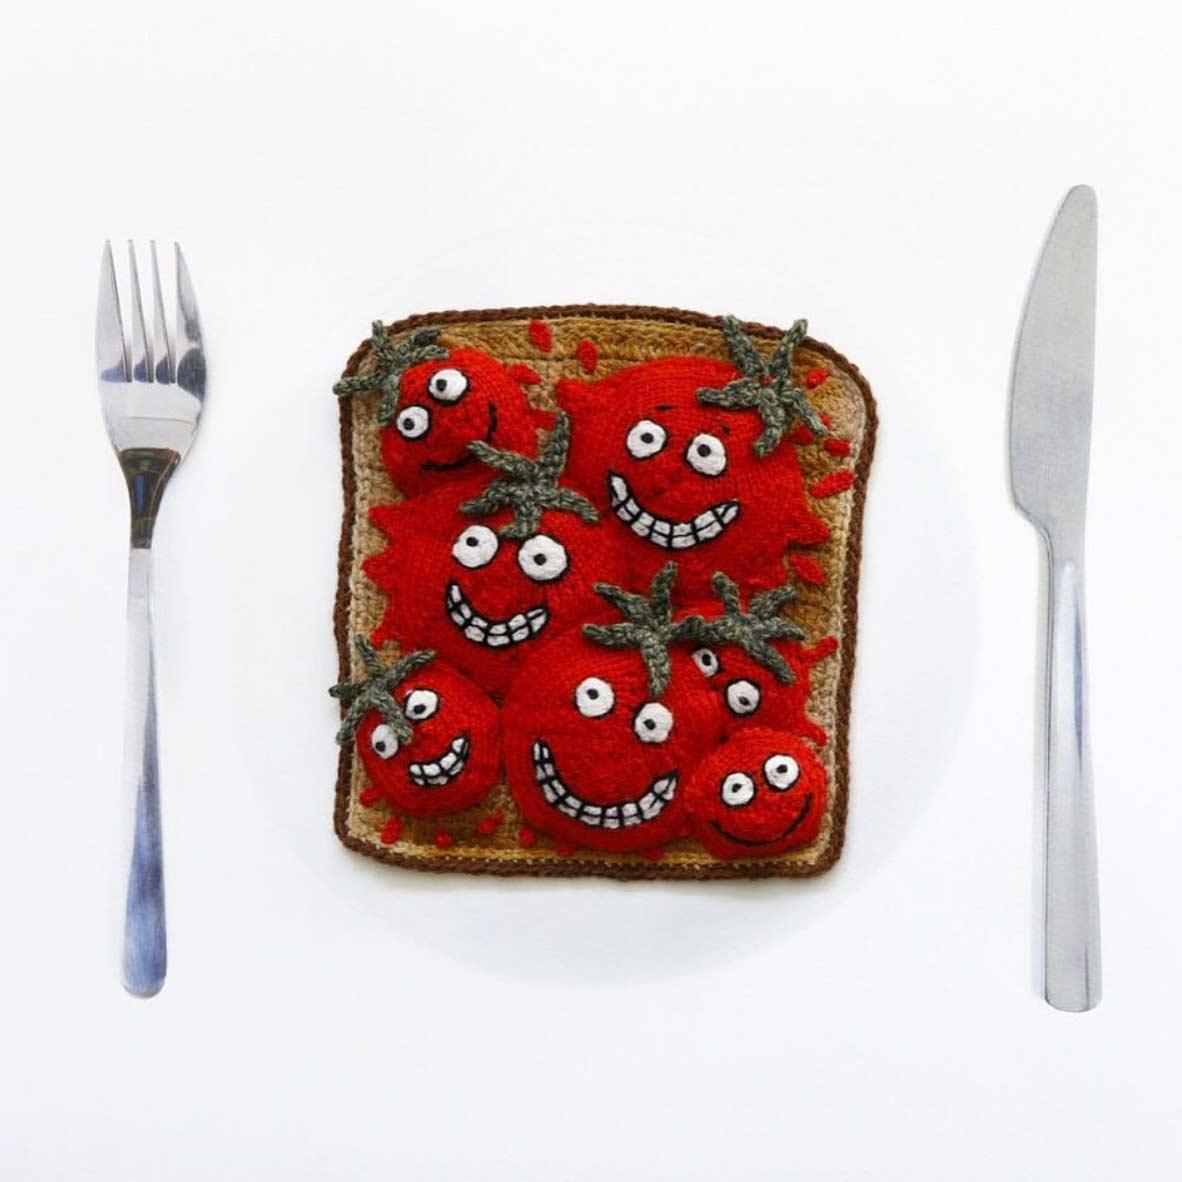 Gehäkeltes Essen gehaekeltes-essen-kate-jenkins_09